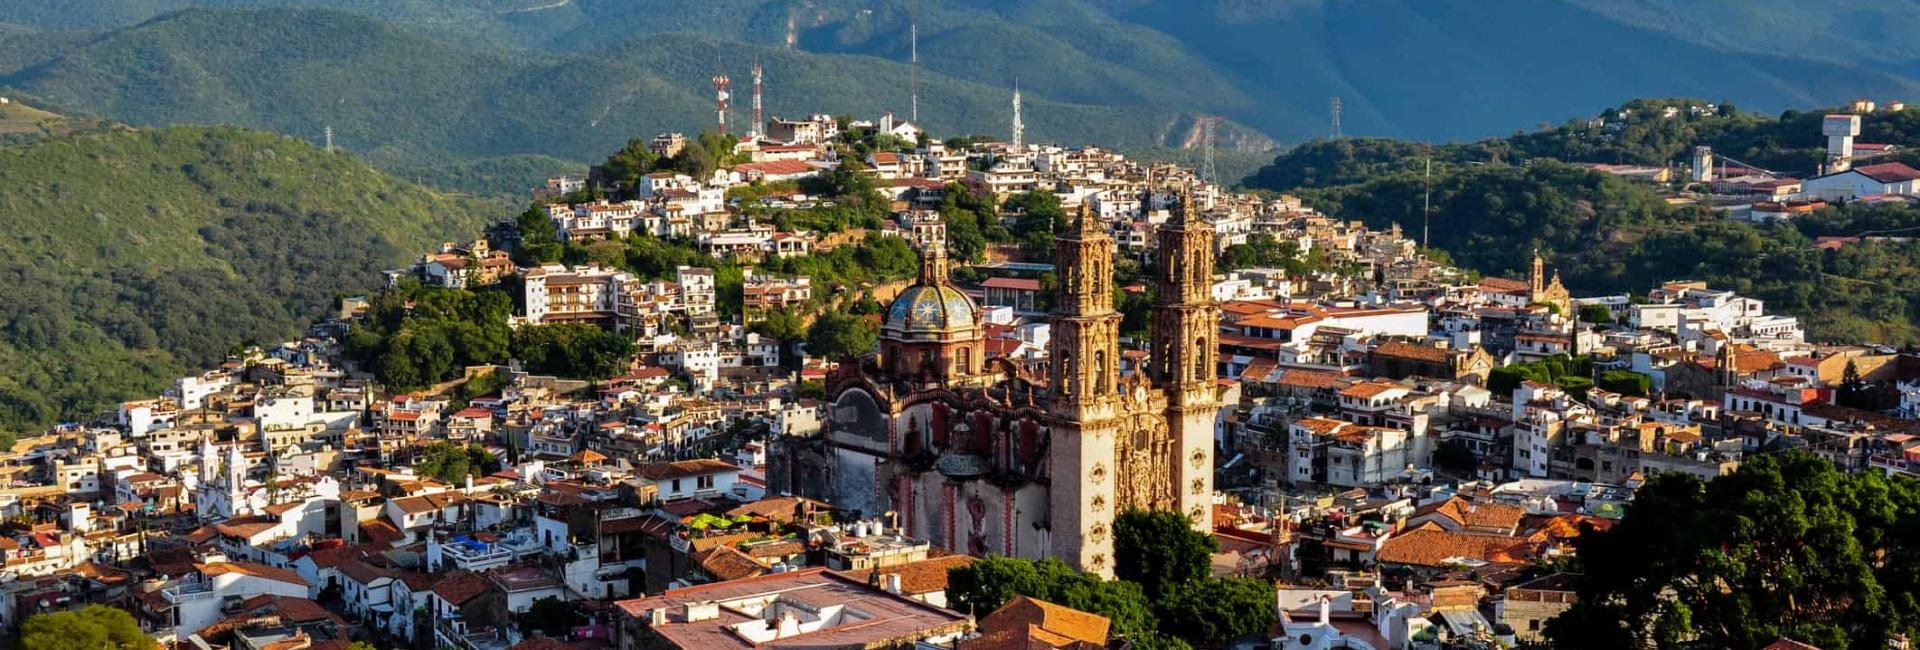 Byen Taxco i Mexico